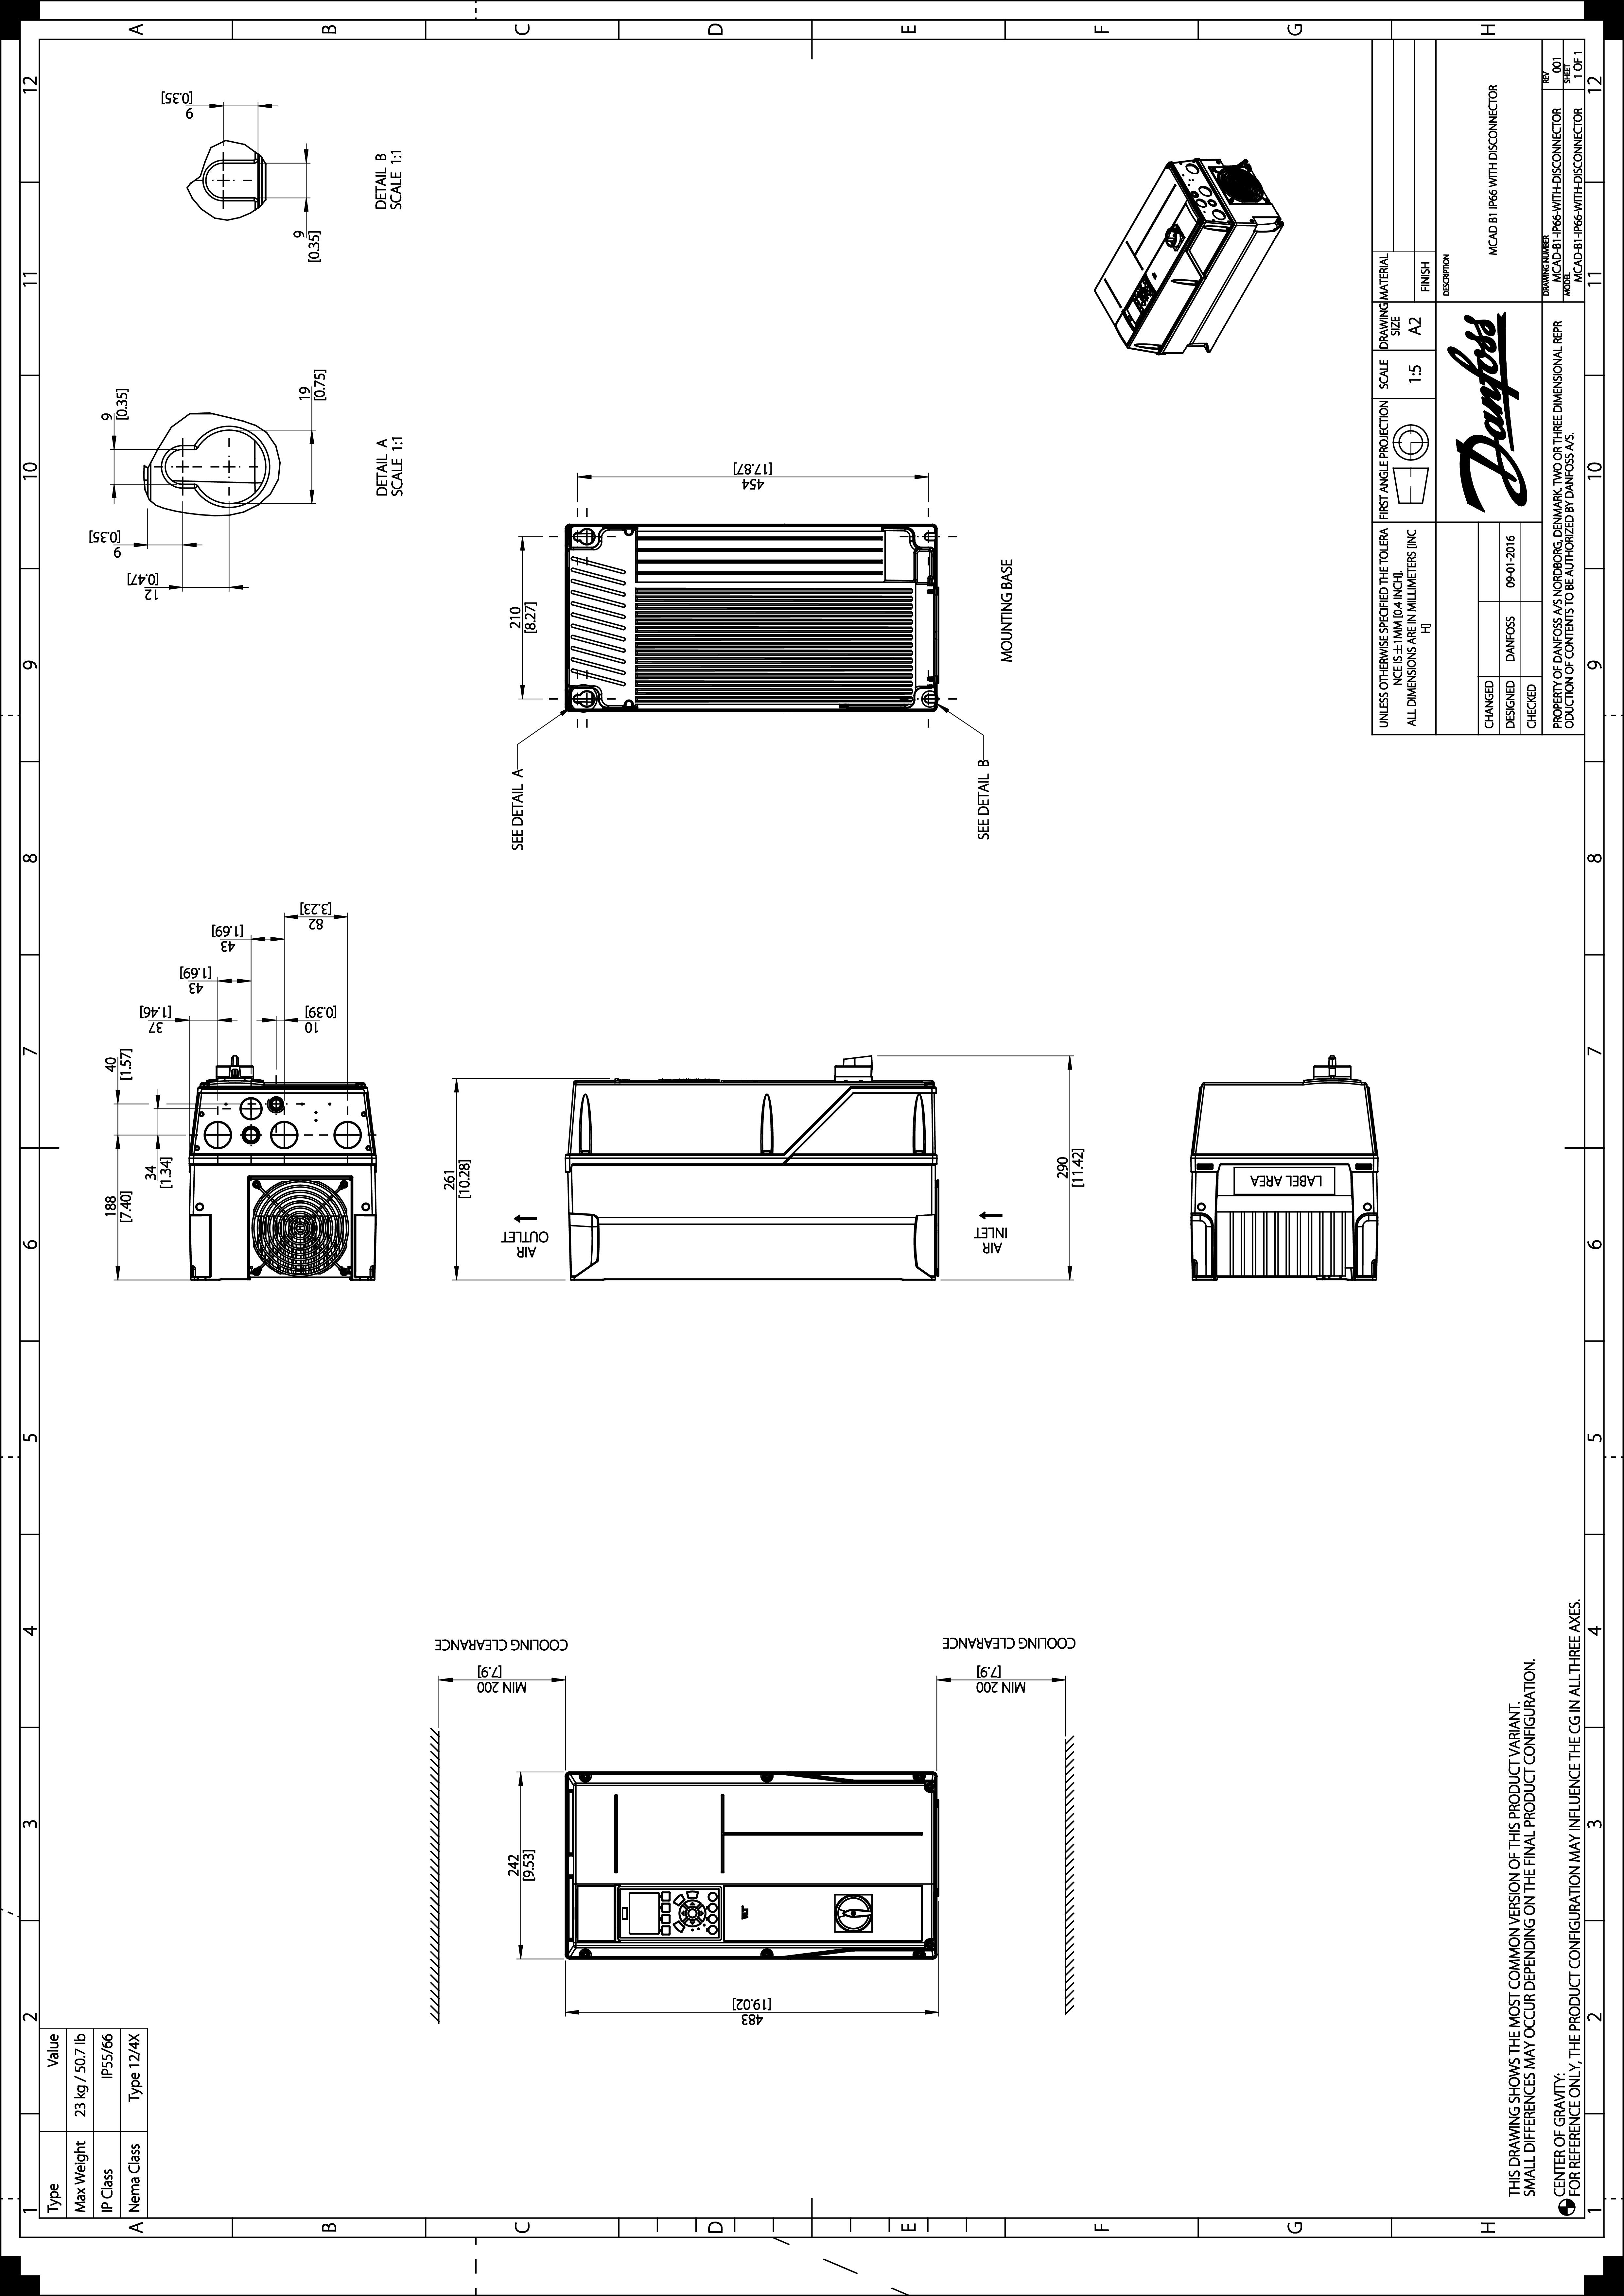 Danfoss inverter wiring diagram solaredge wiring diagram images thermostat wiring controls danfoss wiring diagram library